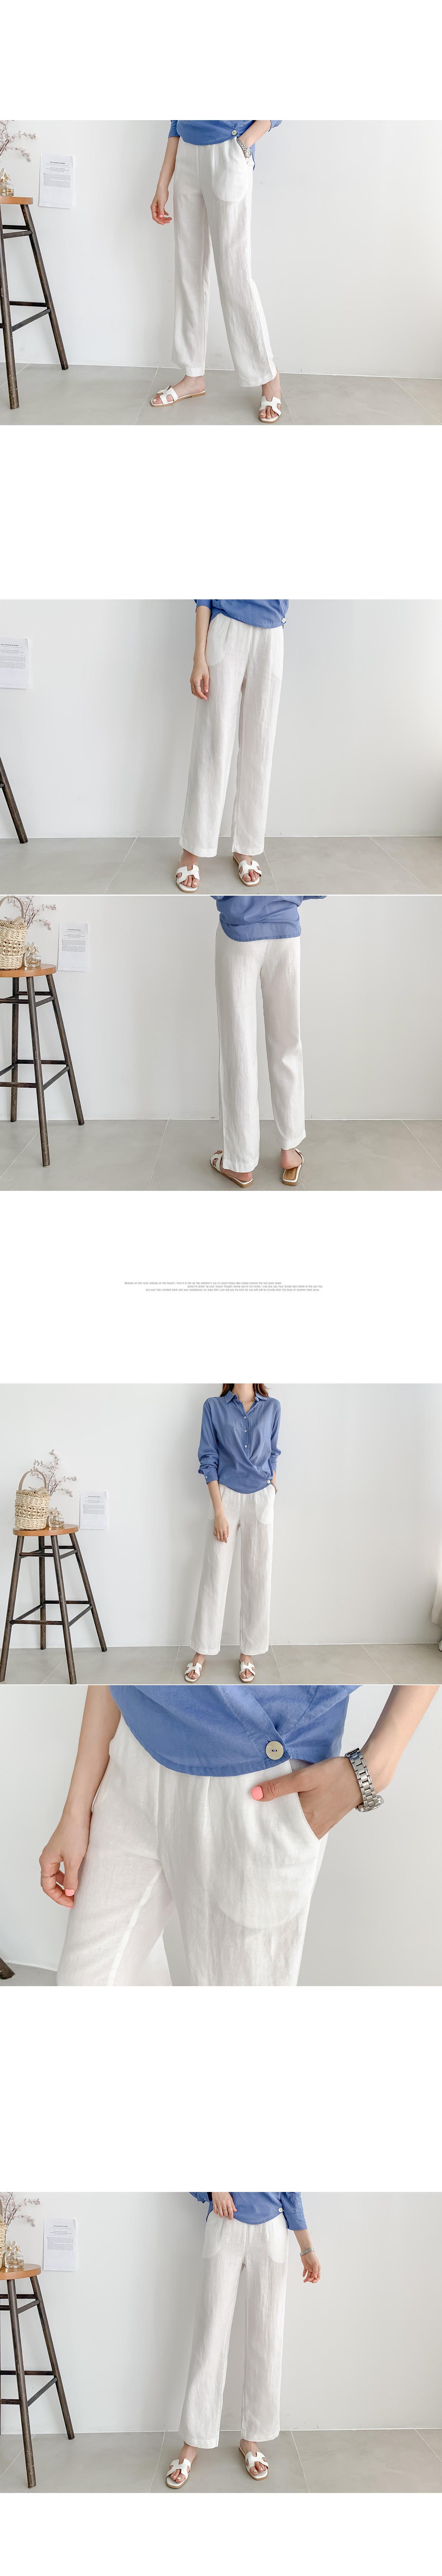 Straight Fit Back Banding Linen Pants #75372